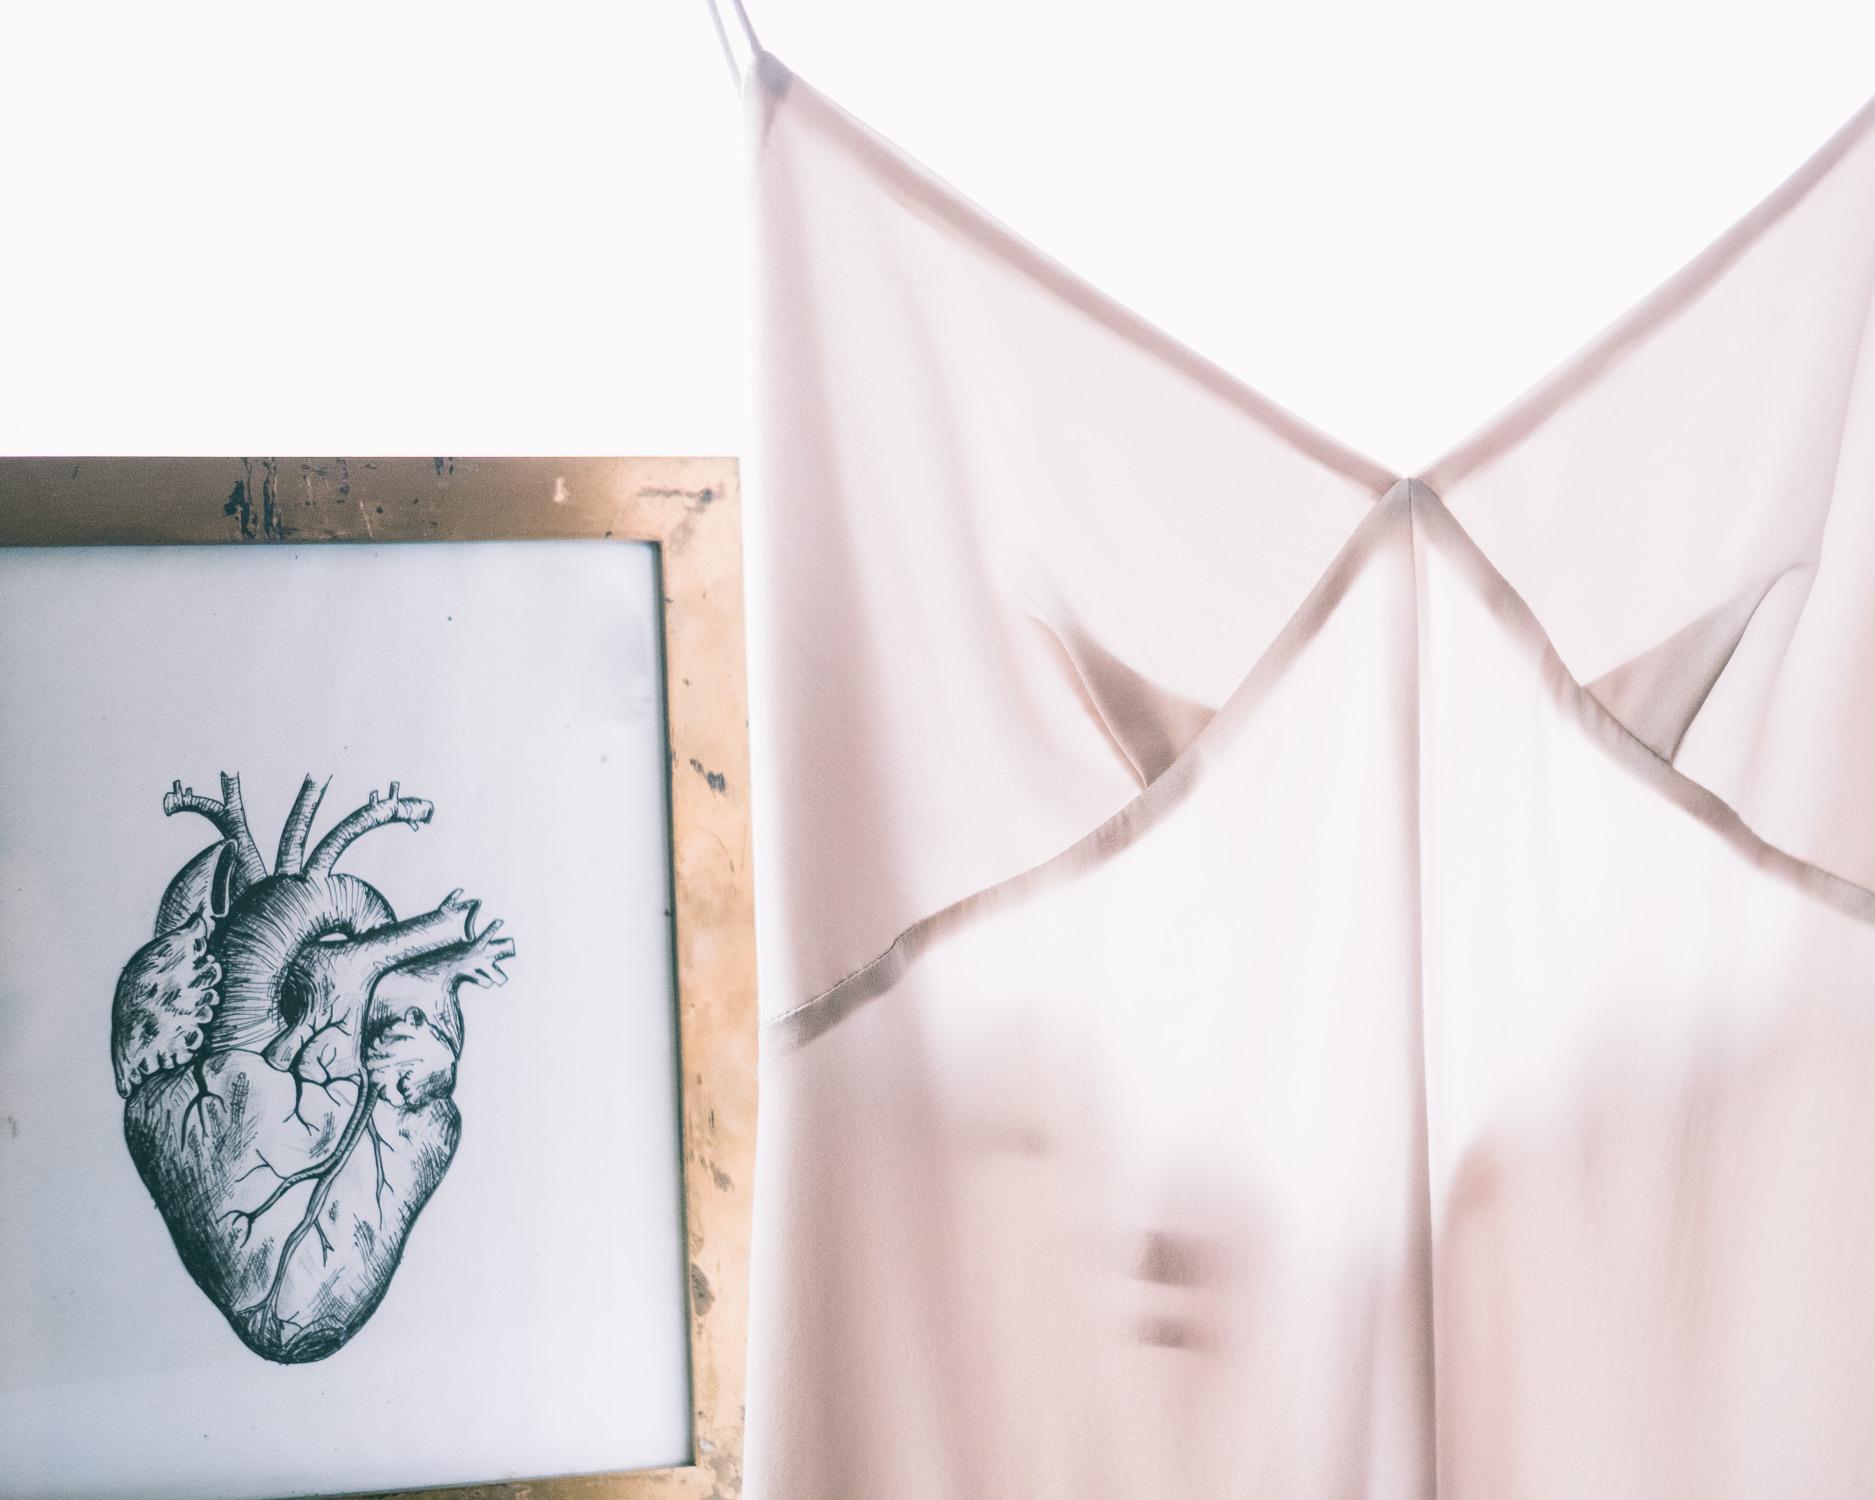 Illustration of heart in gold frame next to silk white wedding dress